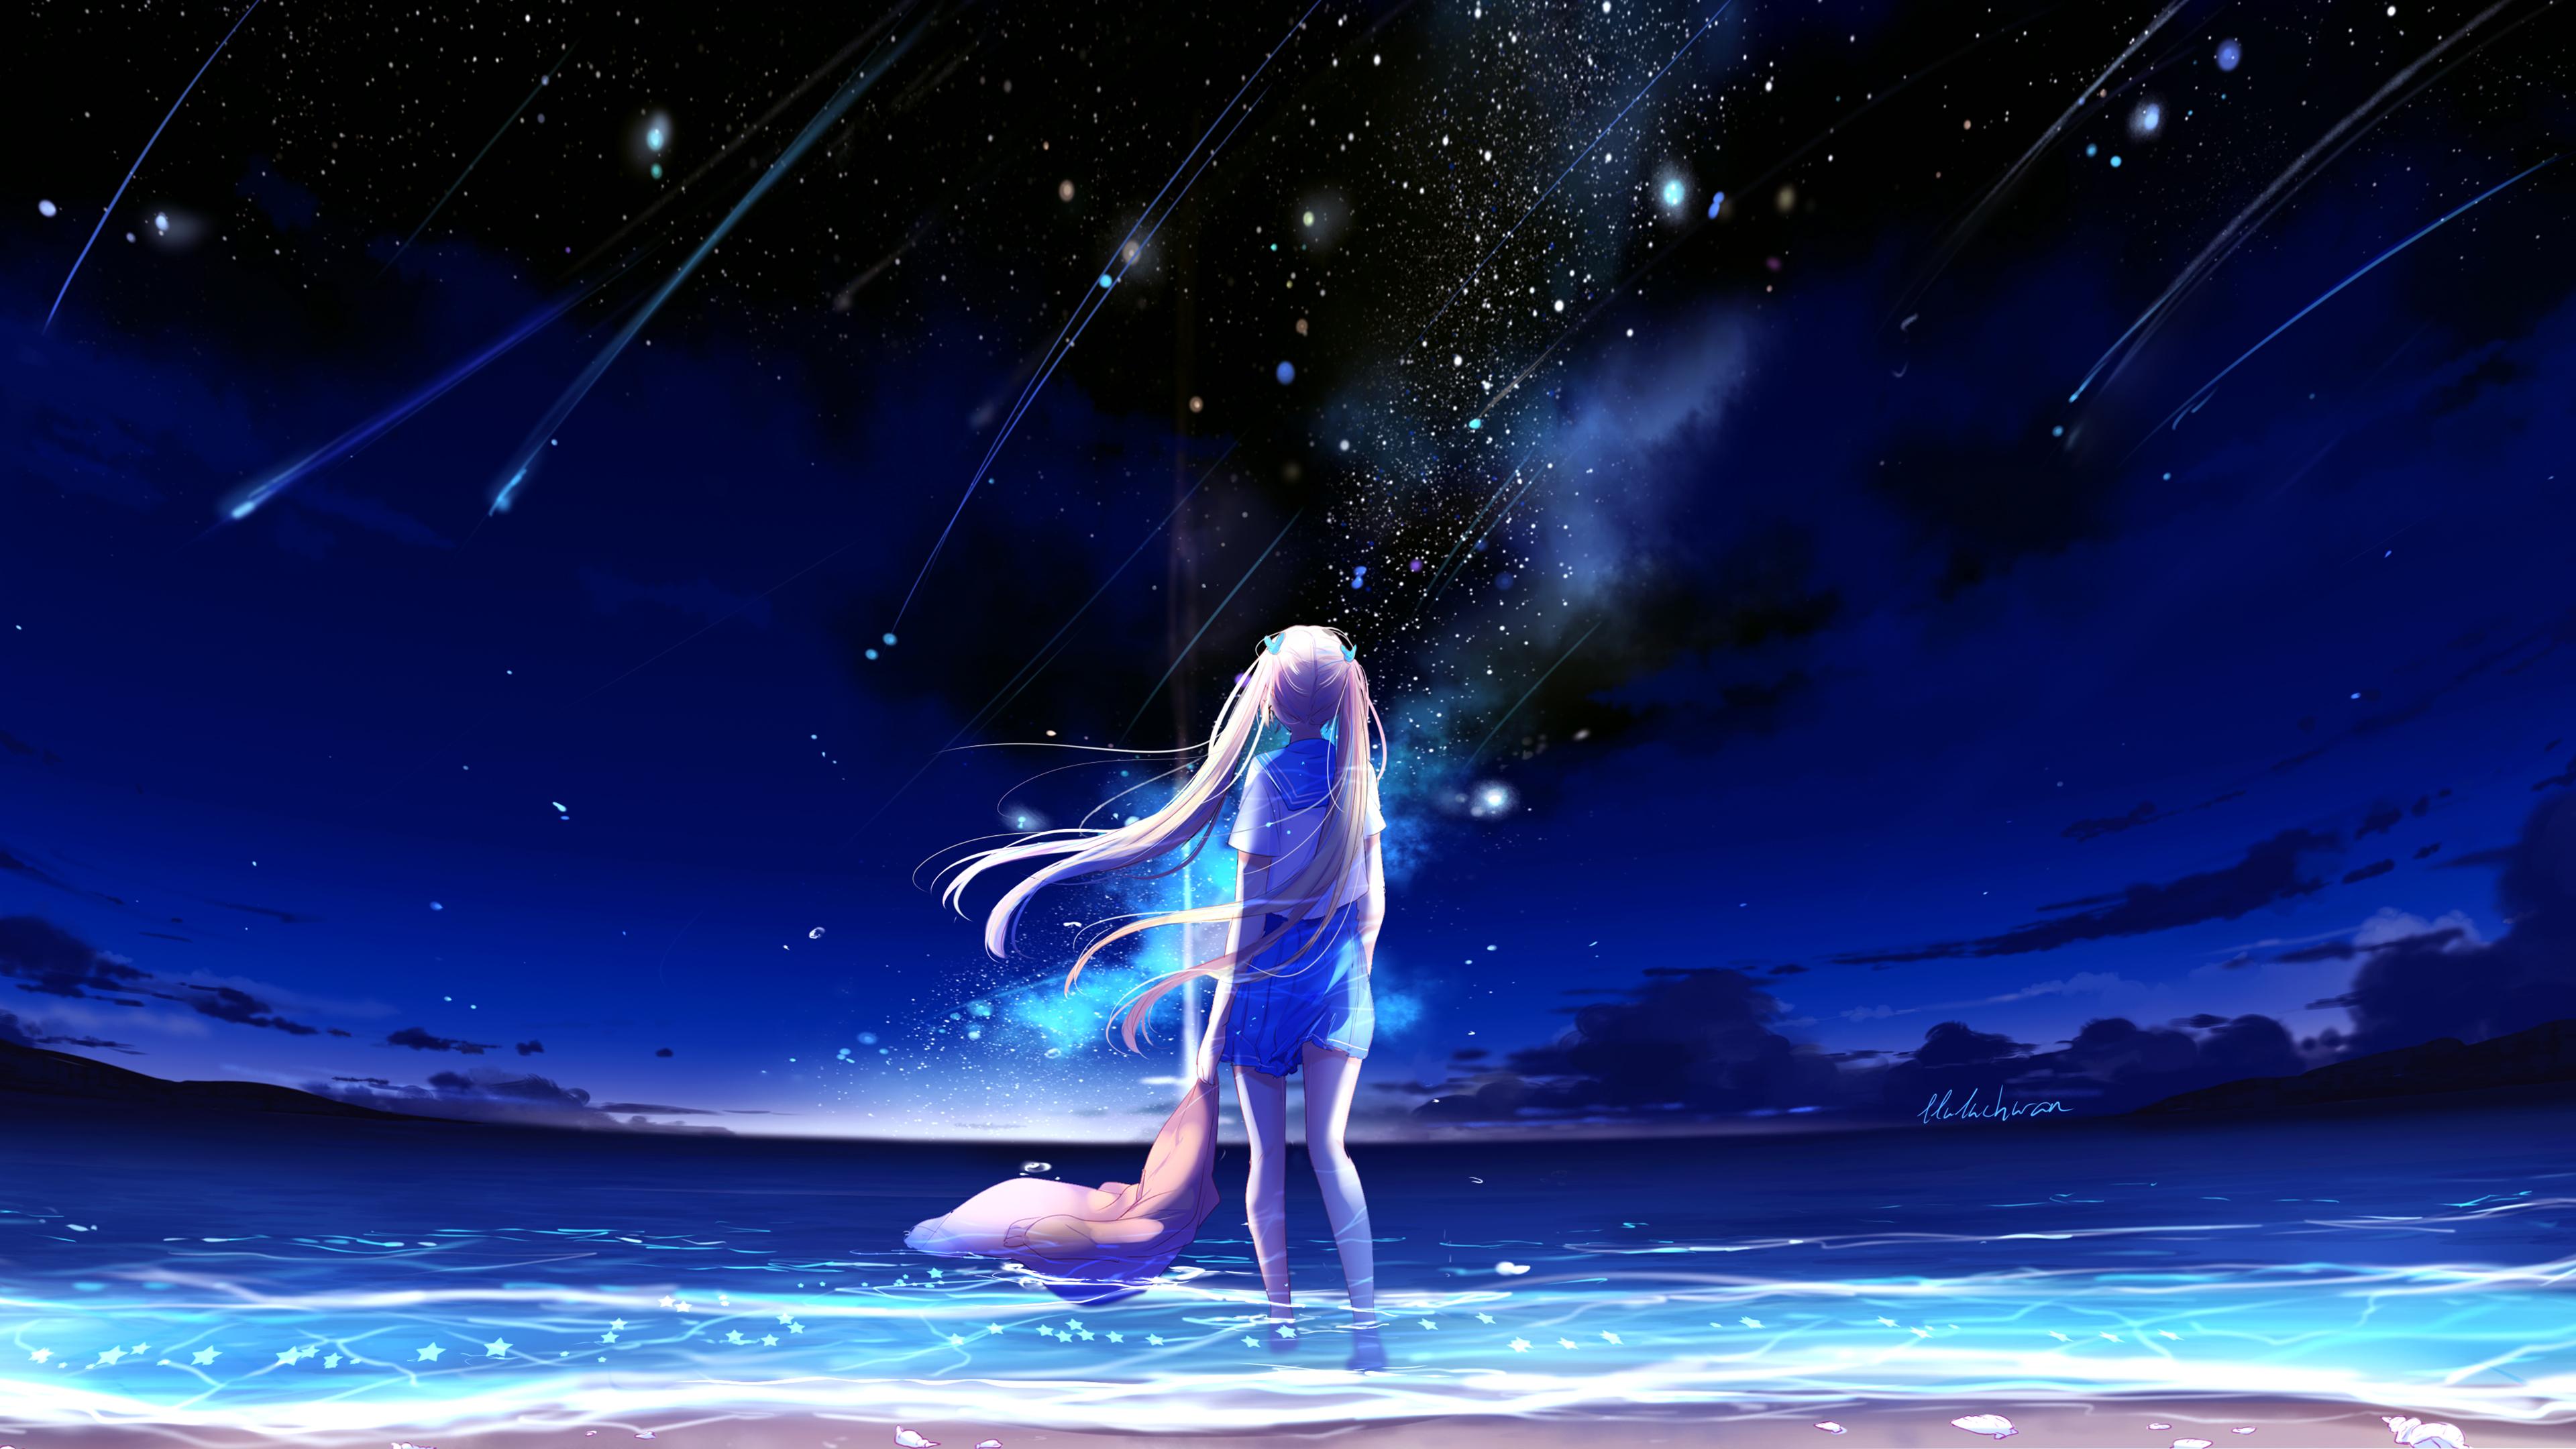 Anime Girl Night Beach 4k Wallpaper Download High